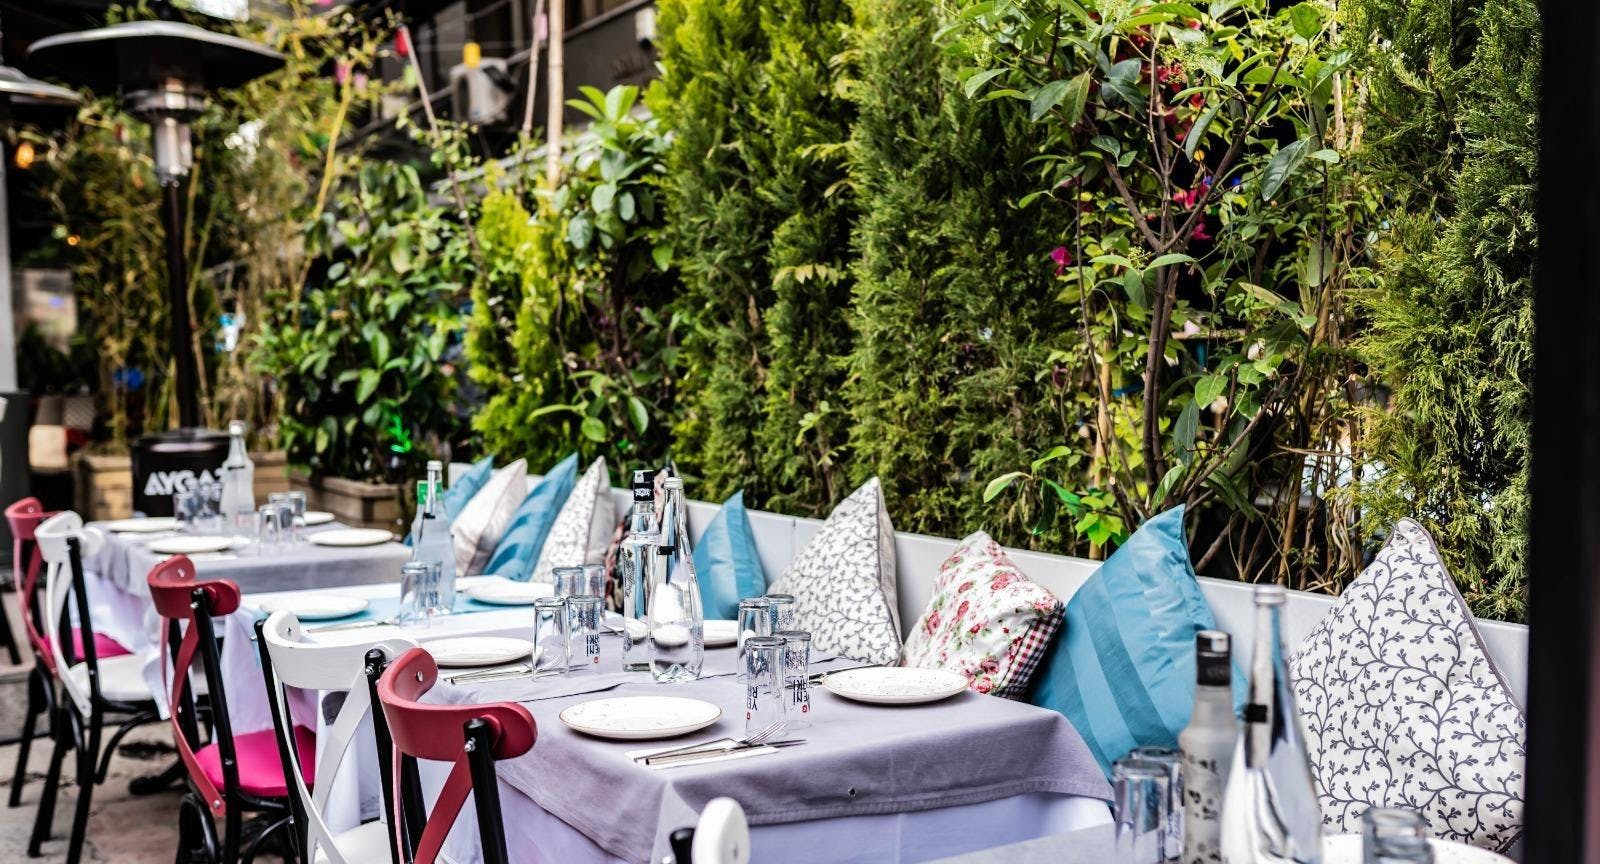 Photo of restaurant Hadi Karaköy in Karaköy, Istanbul